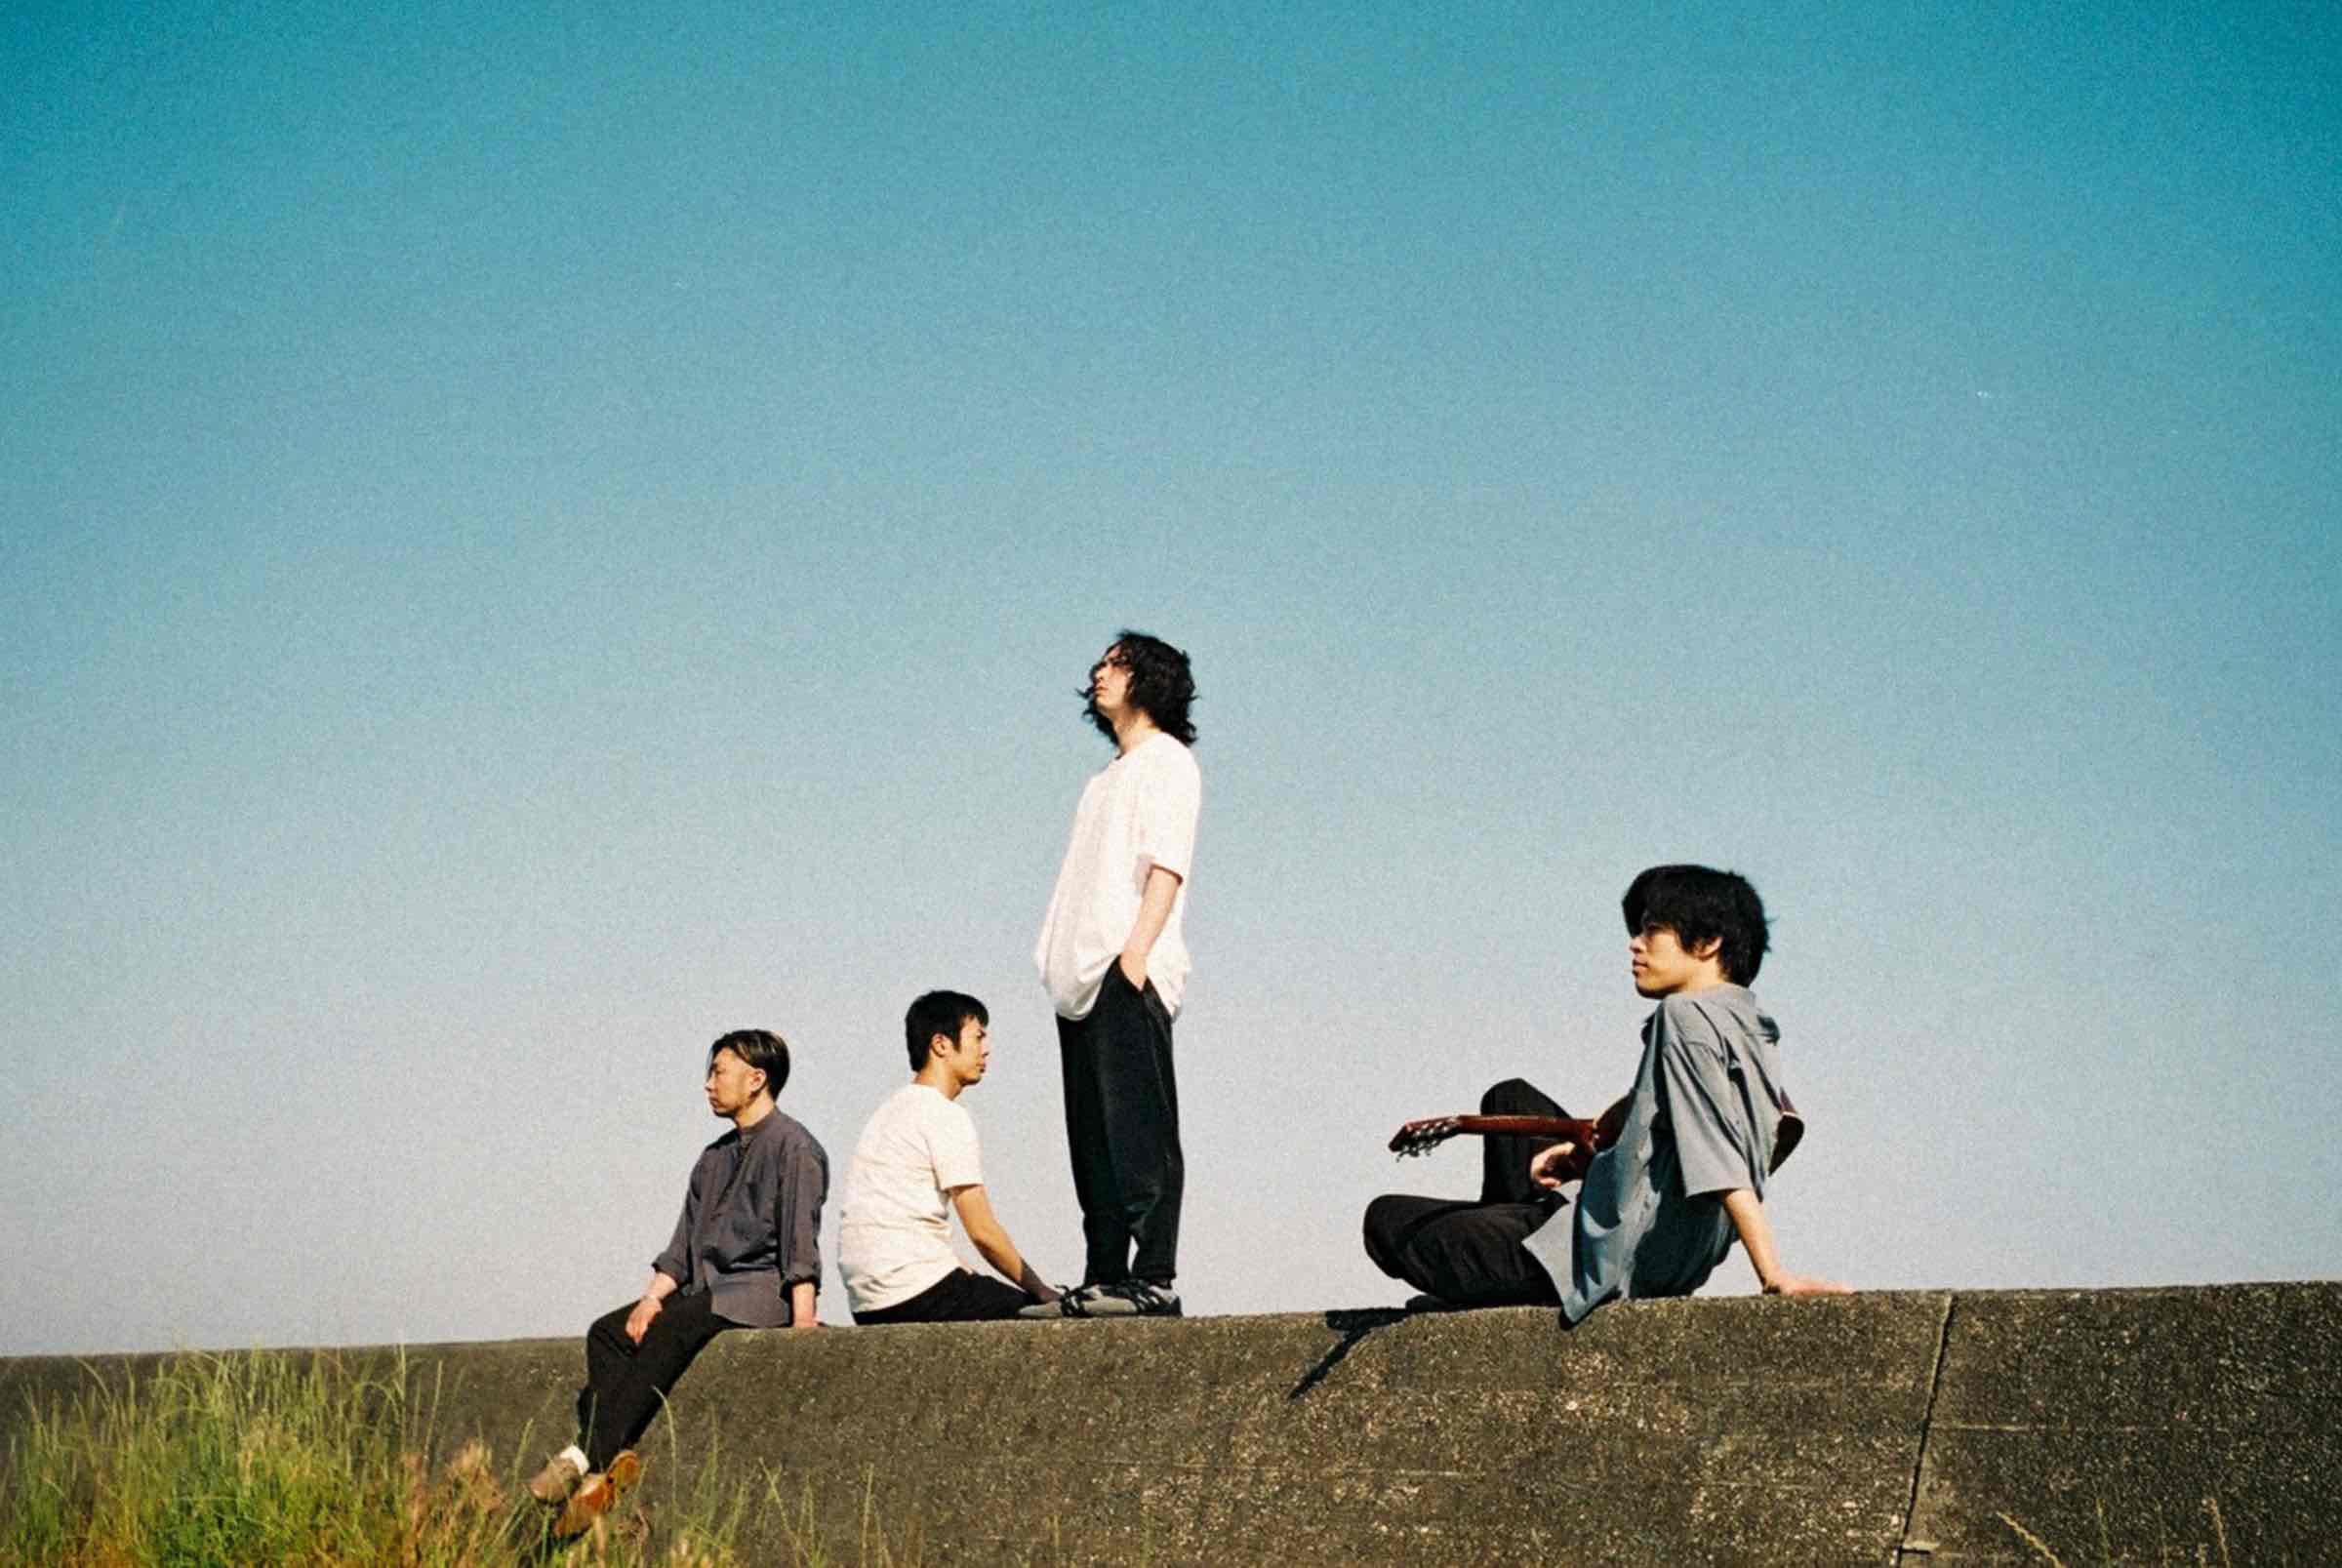 SHINJUKU LOFT KABUKI-CHO 20TH ANNIVERSARY  ロフト三つ巴ライブ2019〜幸せな耳鳴り〜